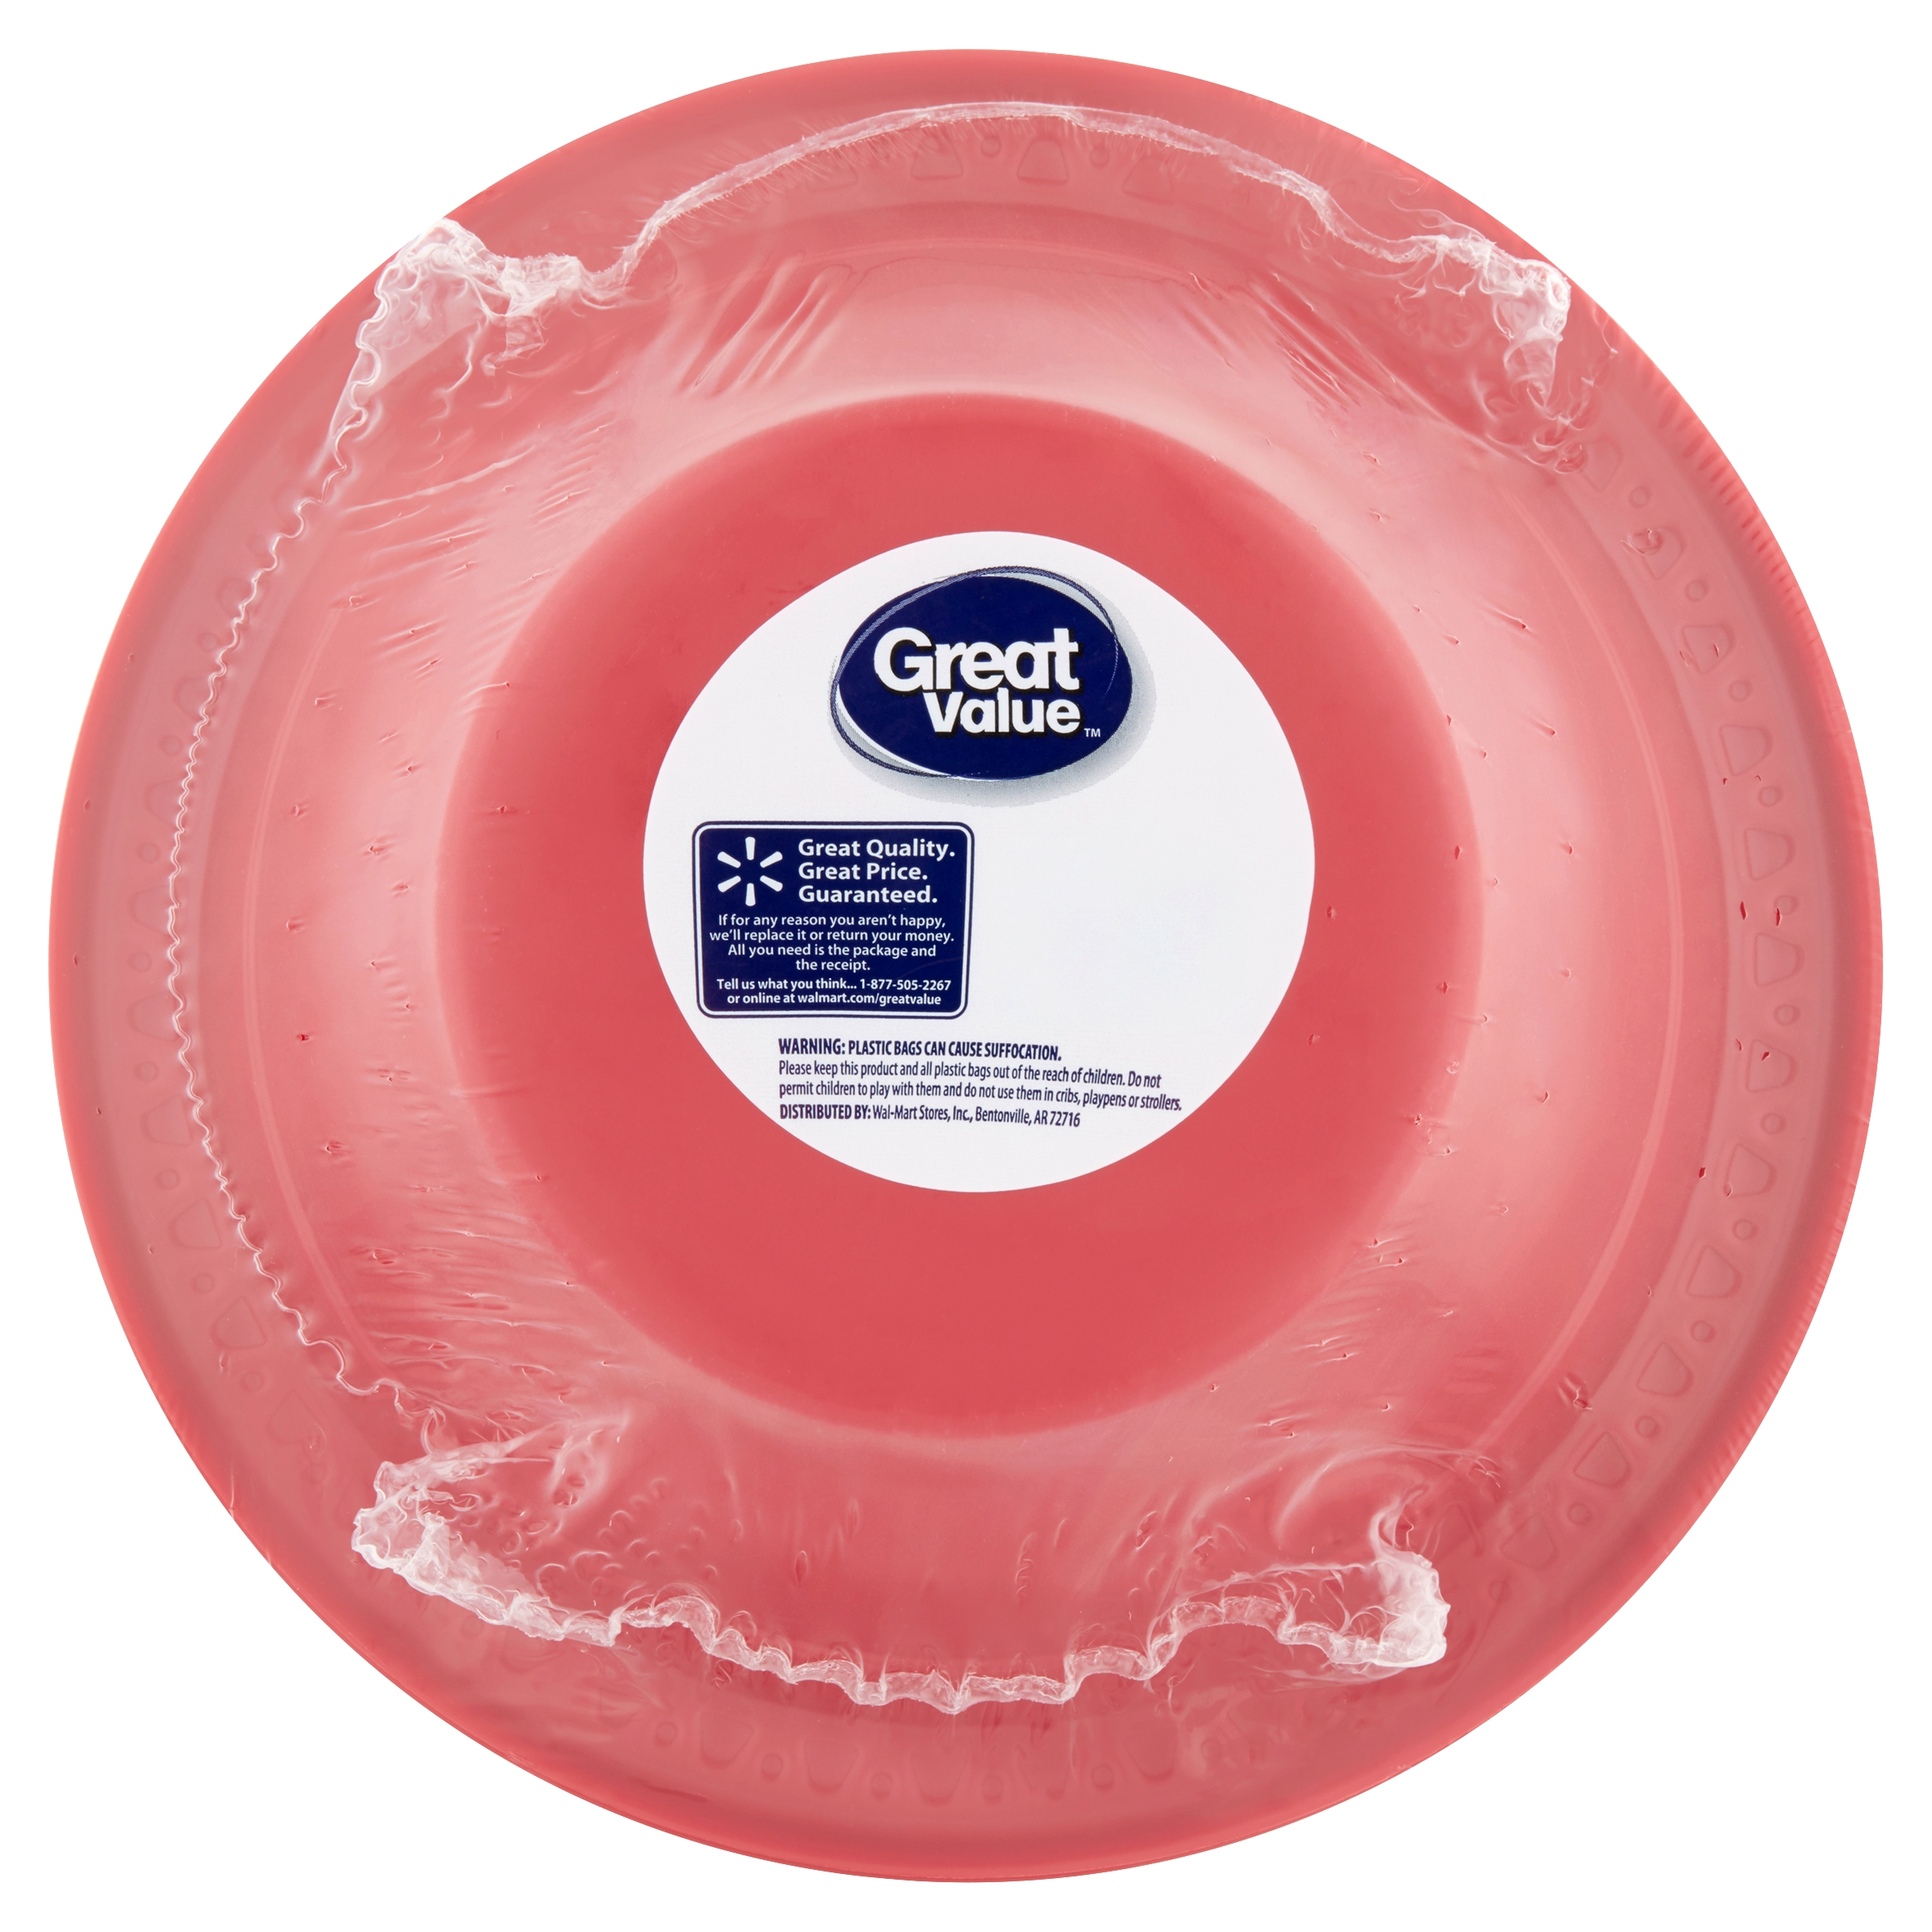 Great Value Plastic Bowls, 20 oz, 28 Count